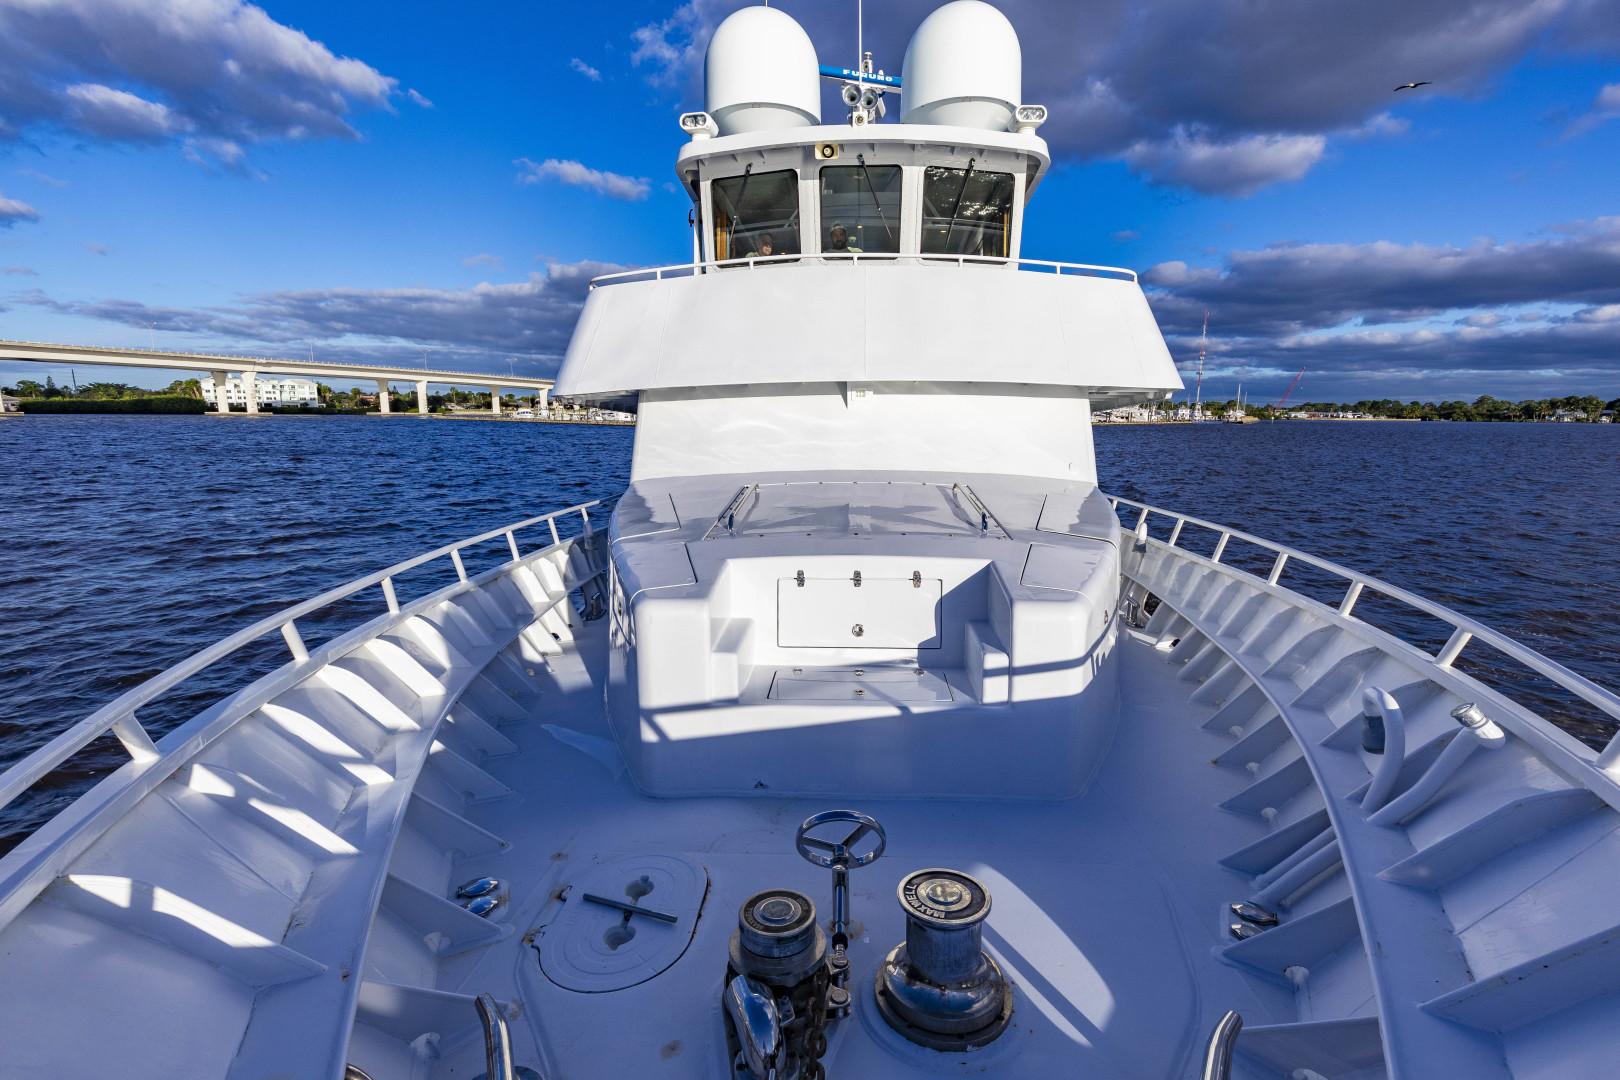 GlassTech-Expedition Yacht 2018-Reset Stuart-Florida-United States-Foredeck-1568547 | Thumbnail